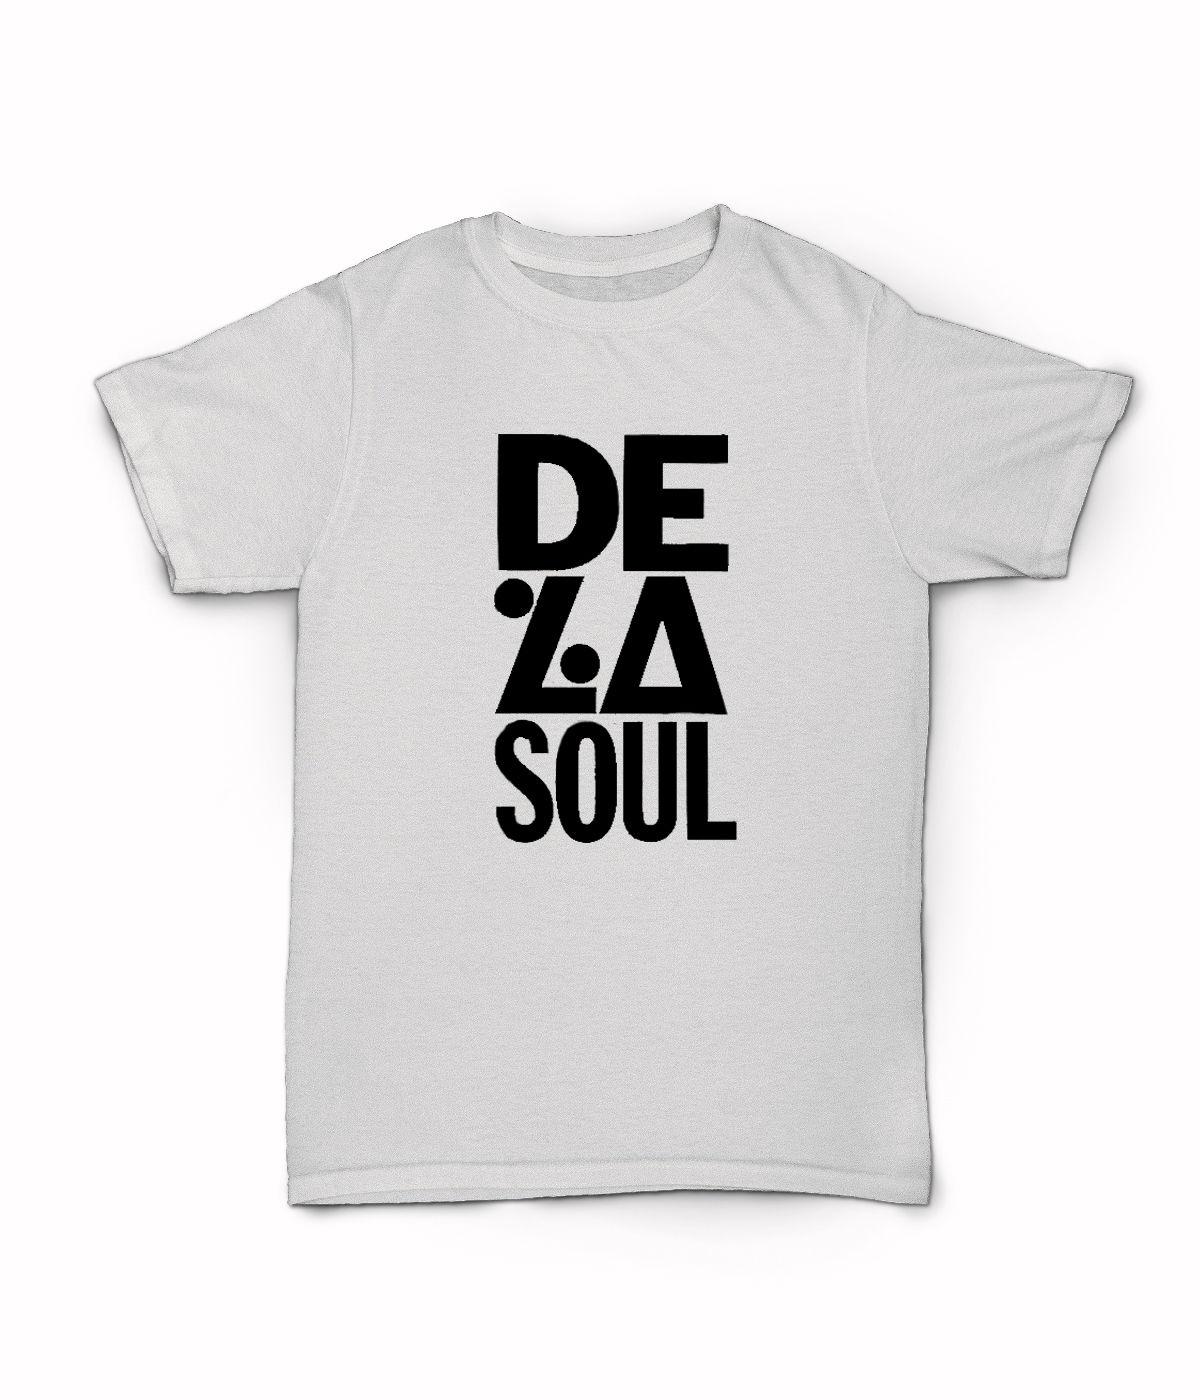 De La Soul T Shirt - Native Tongues Tribe Called Quest Golden Era Hip Hop NGreat Discount Cotton Men Tee